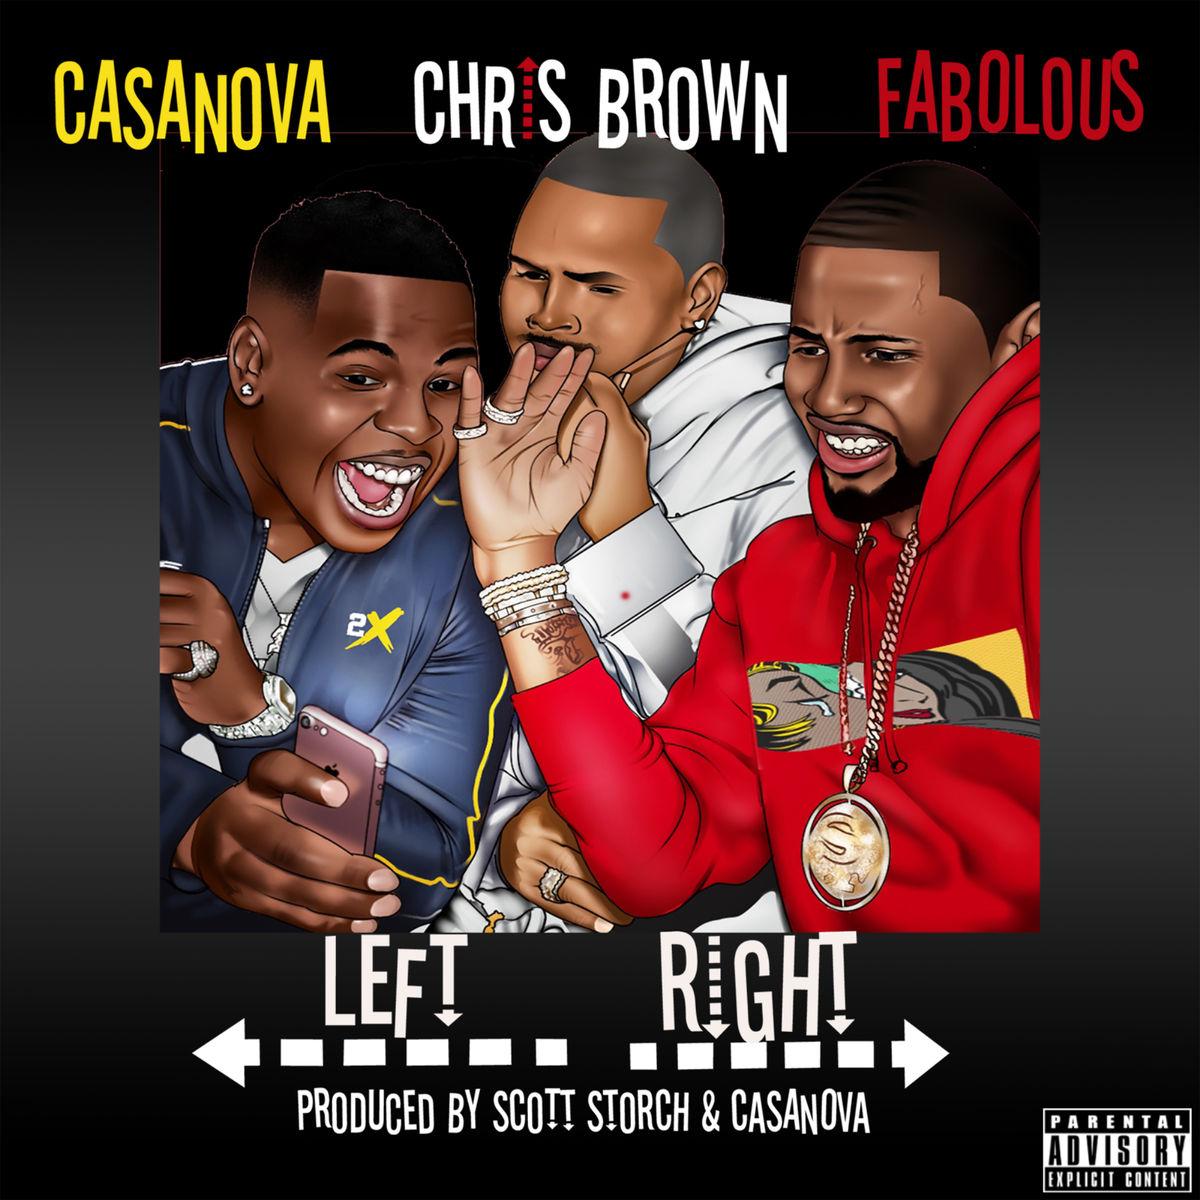 casanova chris brown fabolous left right